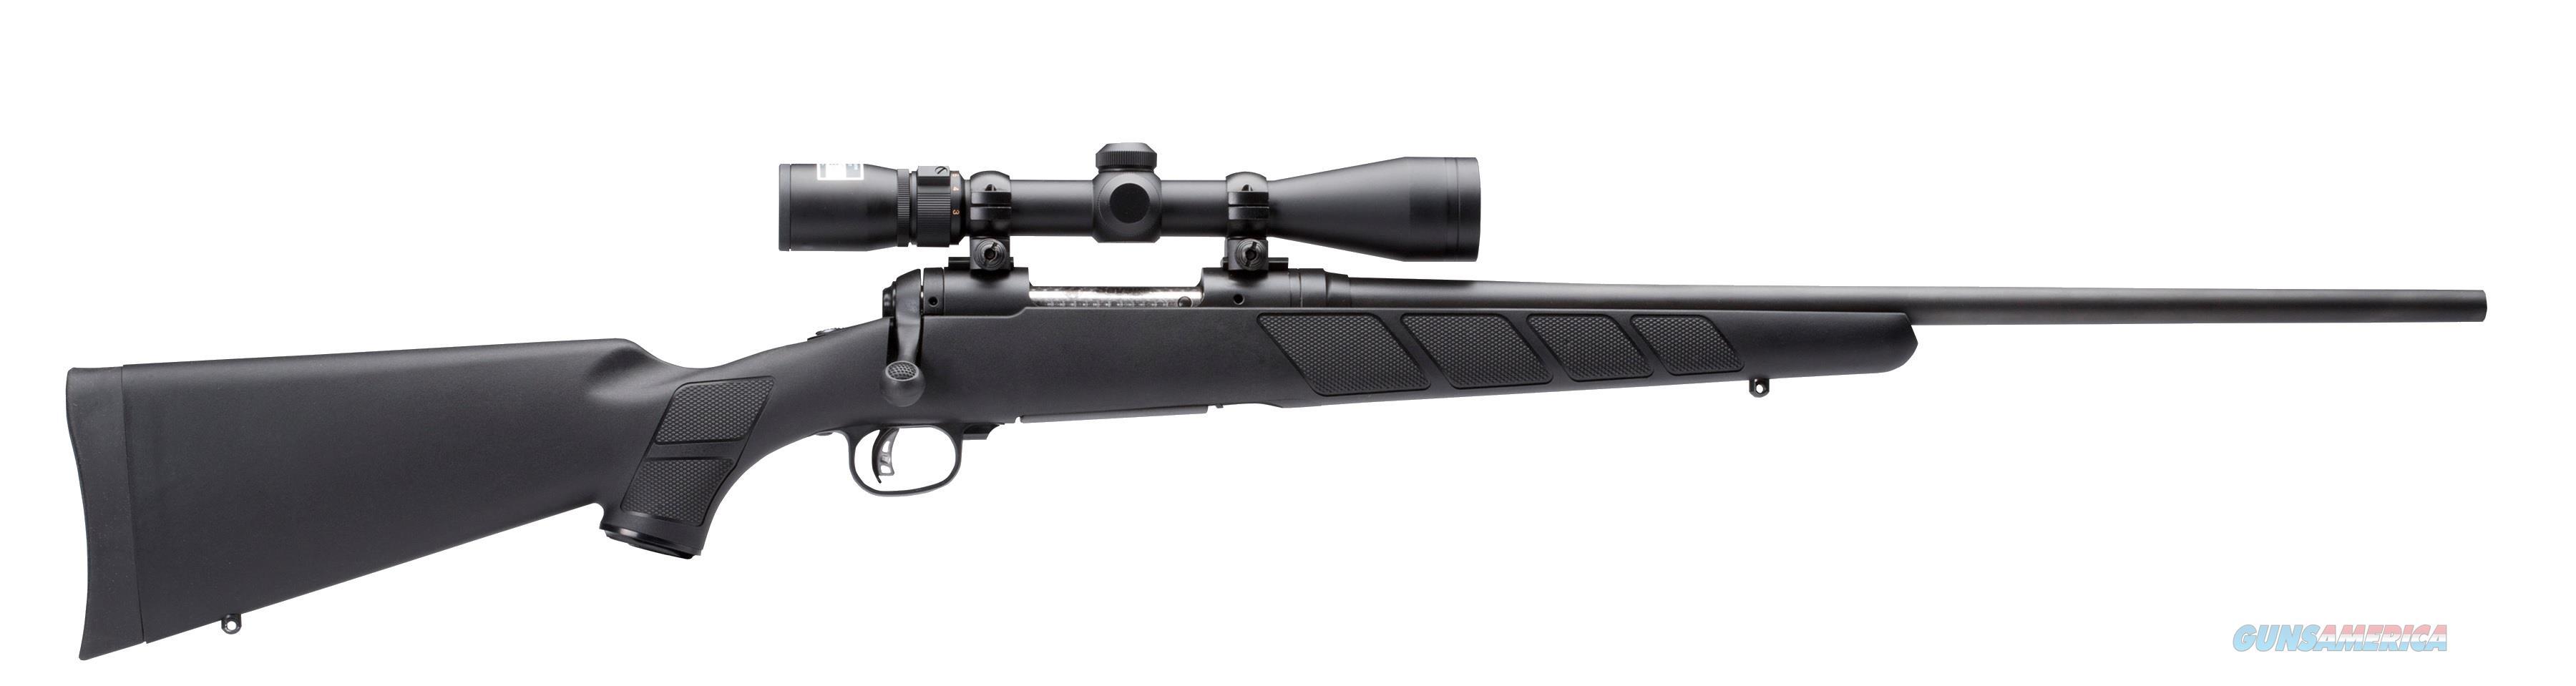 Savage 11/111 Trophy Hunter XP .30-06 Springfield NIKON Scope 19690   Guns > Rifles > Savage Rifles > 11/111